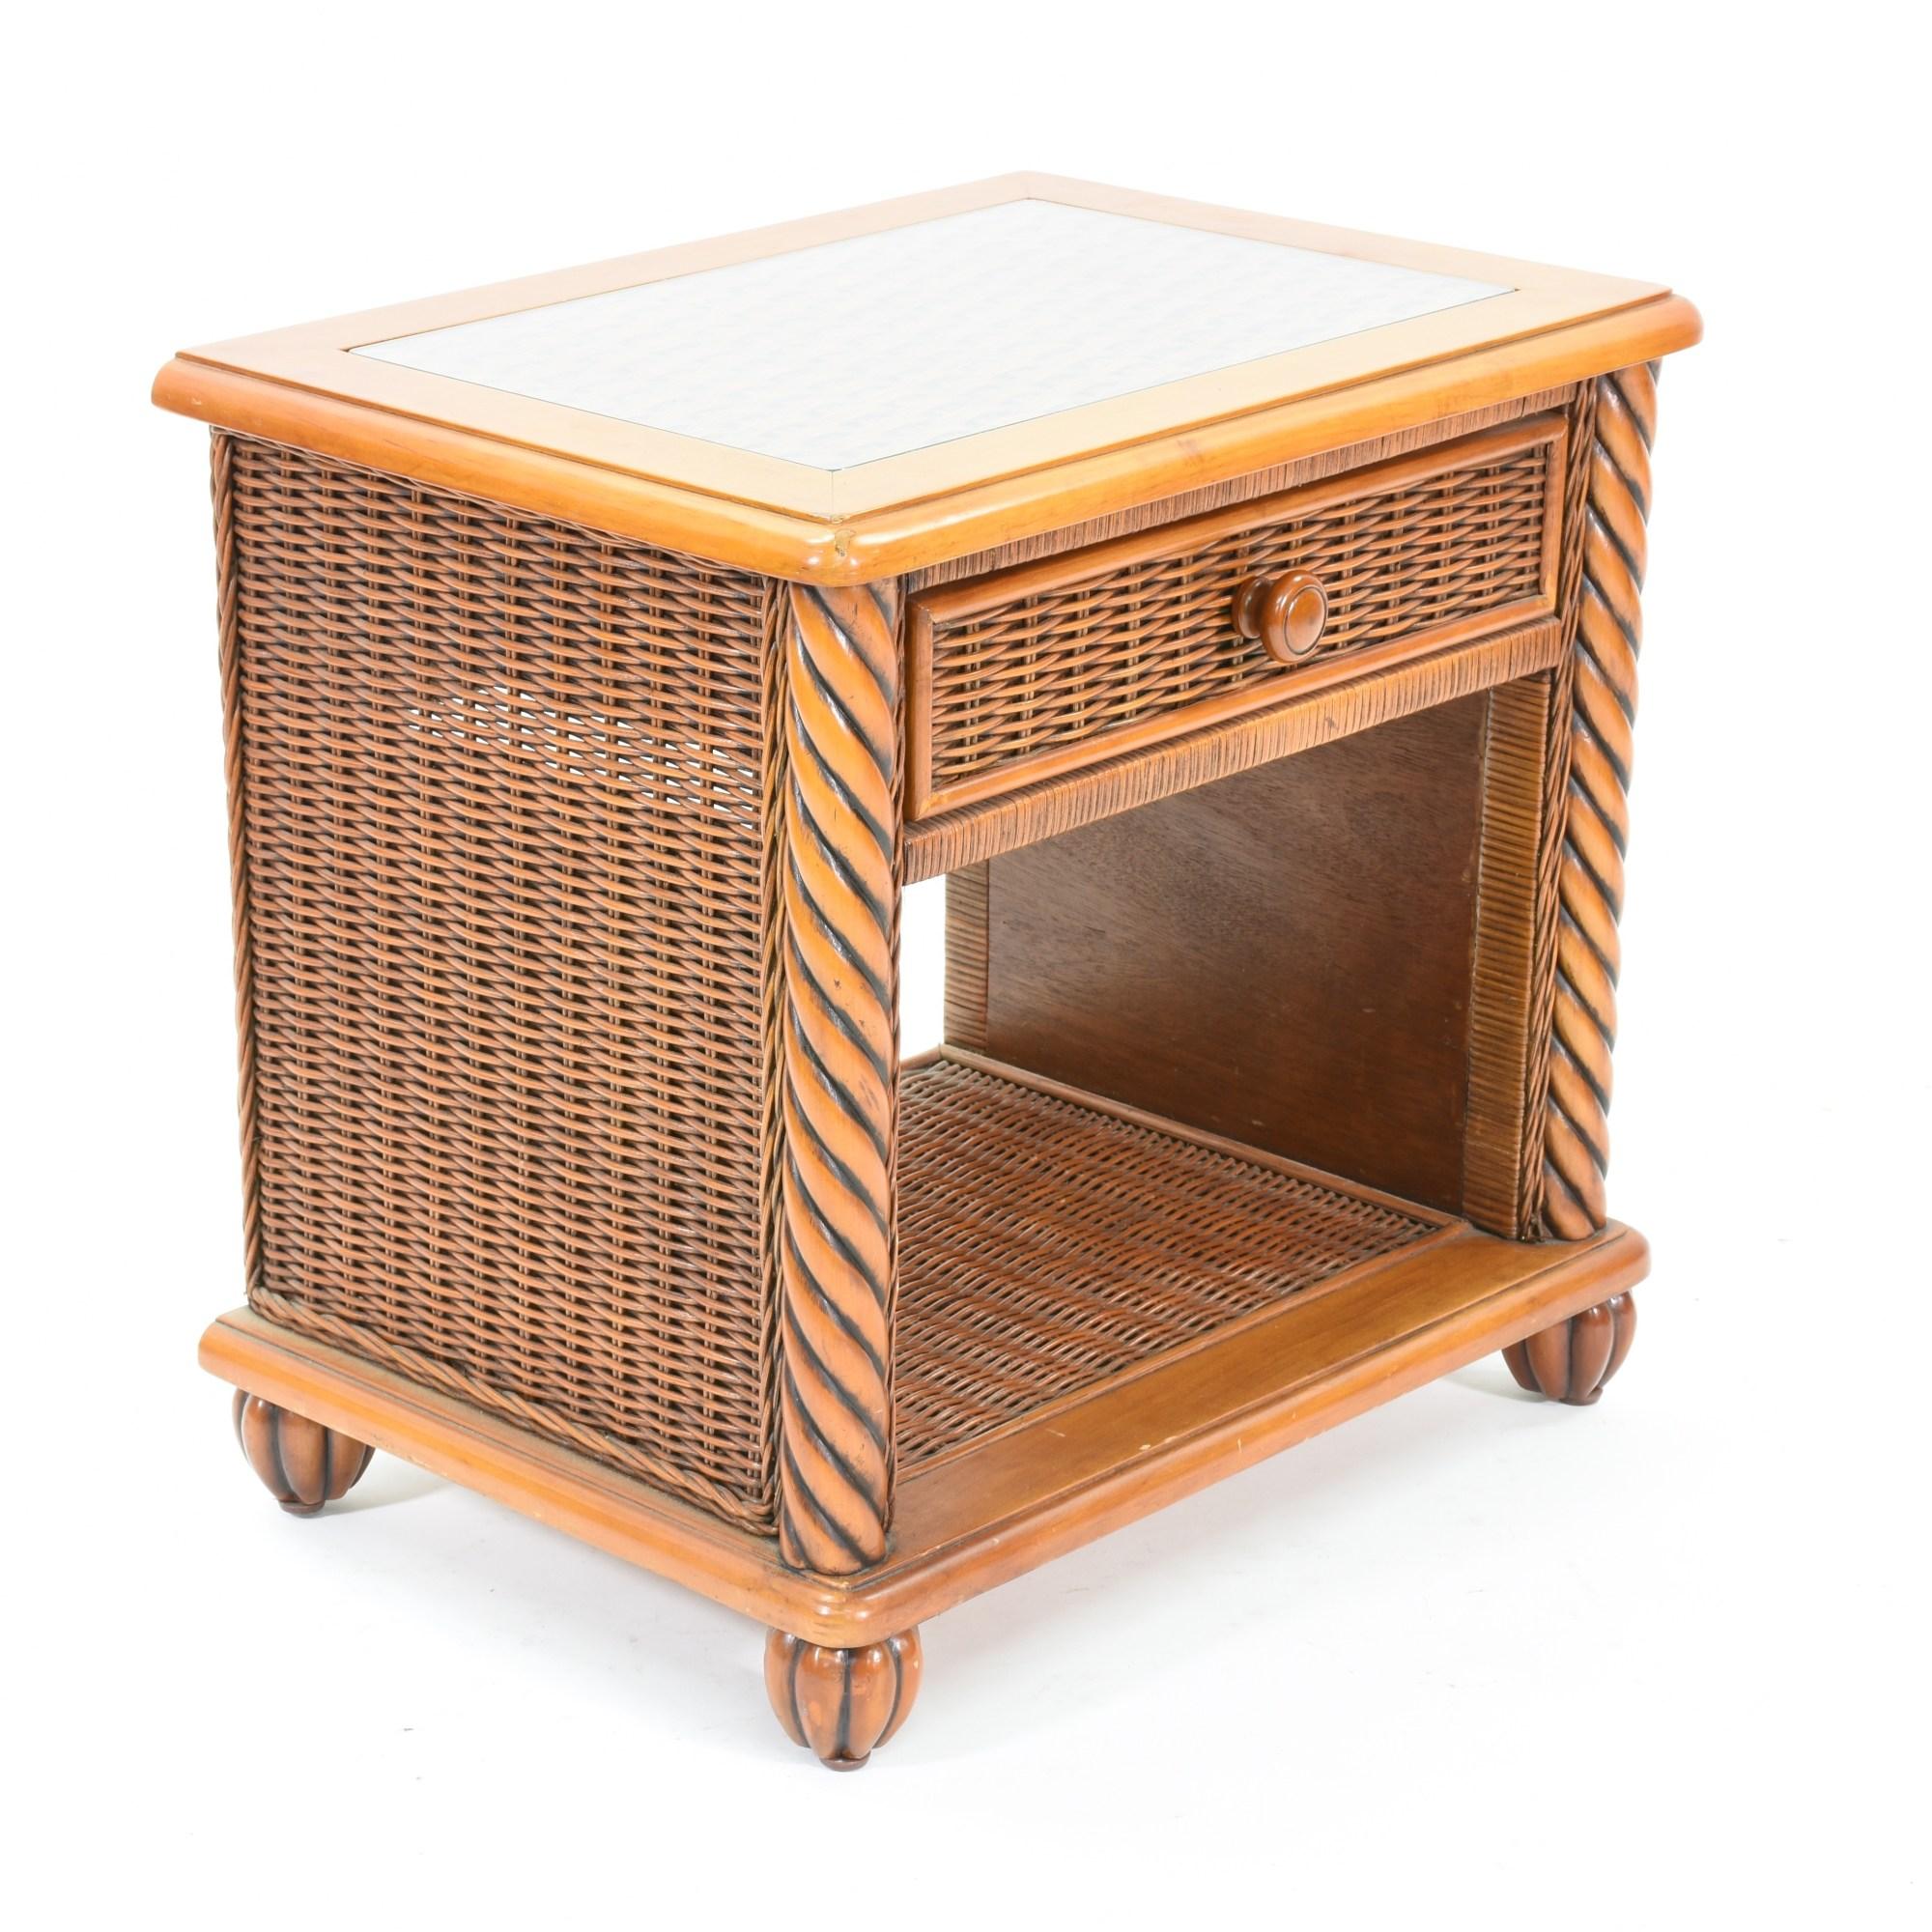 Pair Of Wicker Nightstands With Glass Top Loveseat Vintage Furniture San Diego & Los Angeles